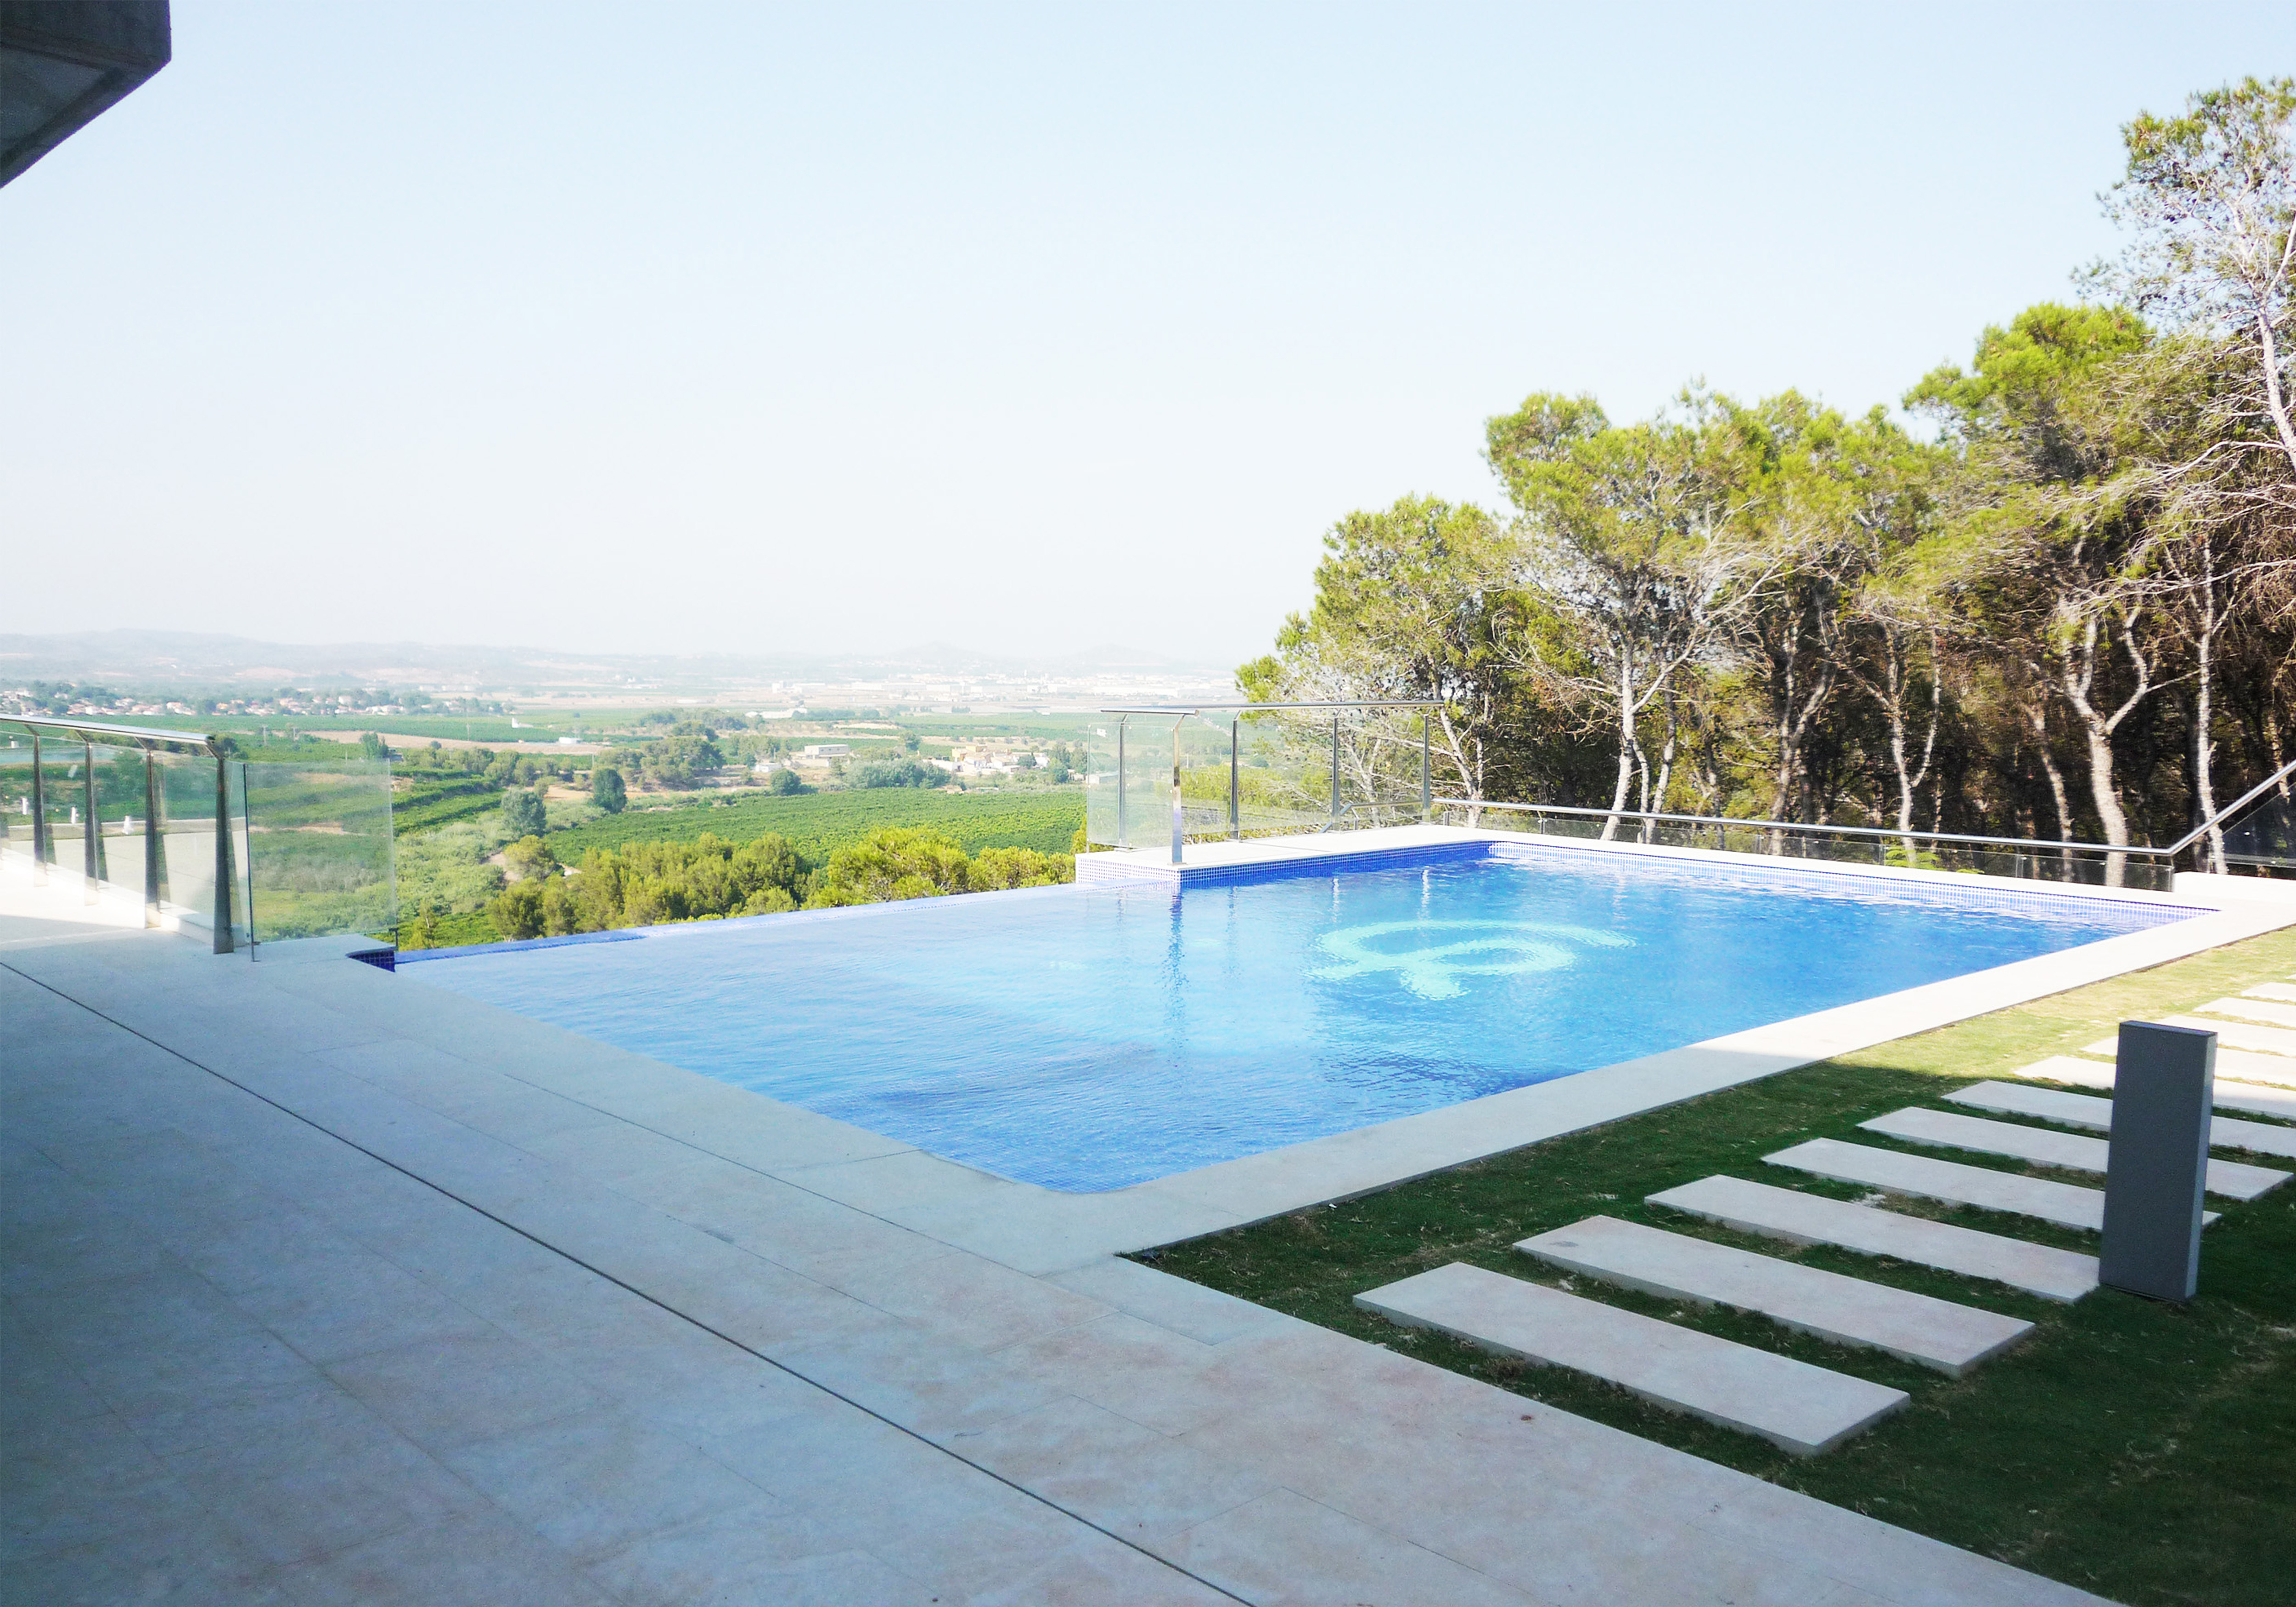 Piscinas desbordantes pisicilimp especialistas en piscinas for Piscinas desbordantes precios